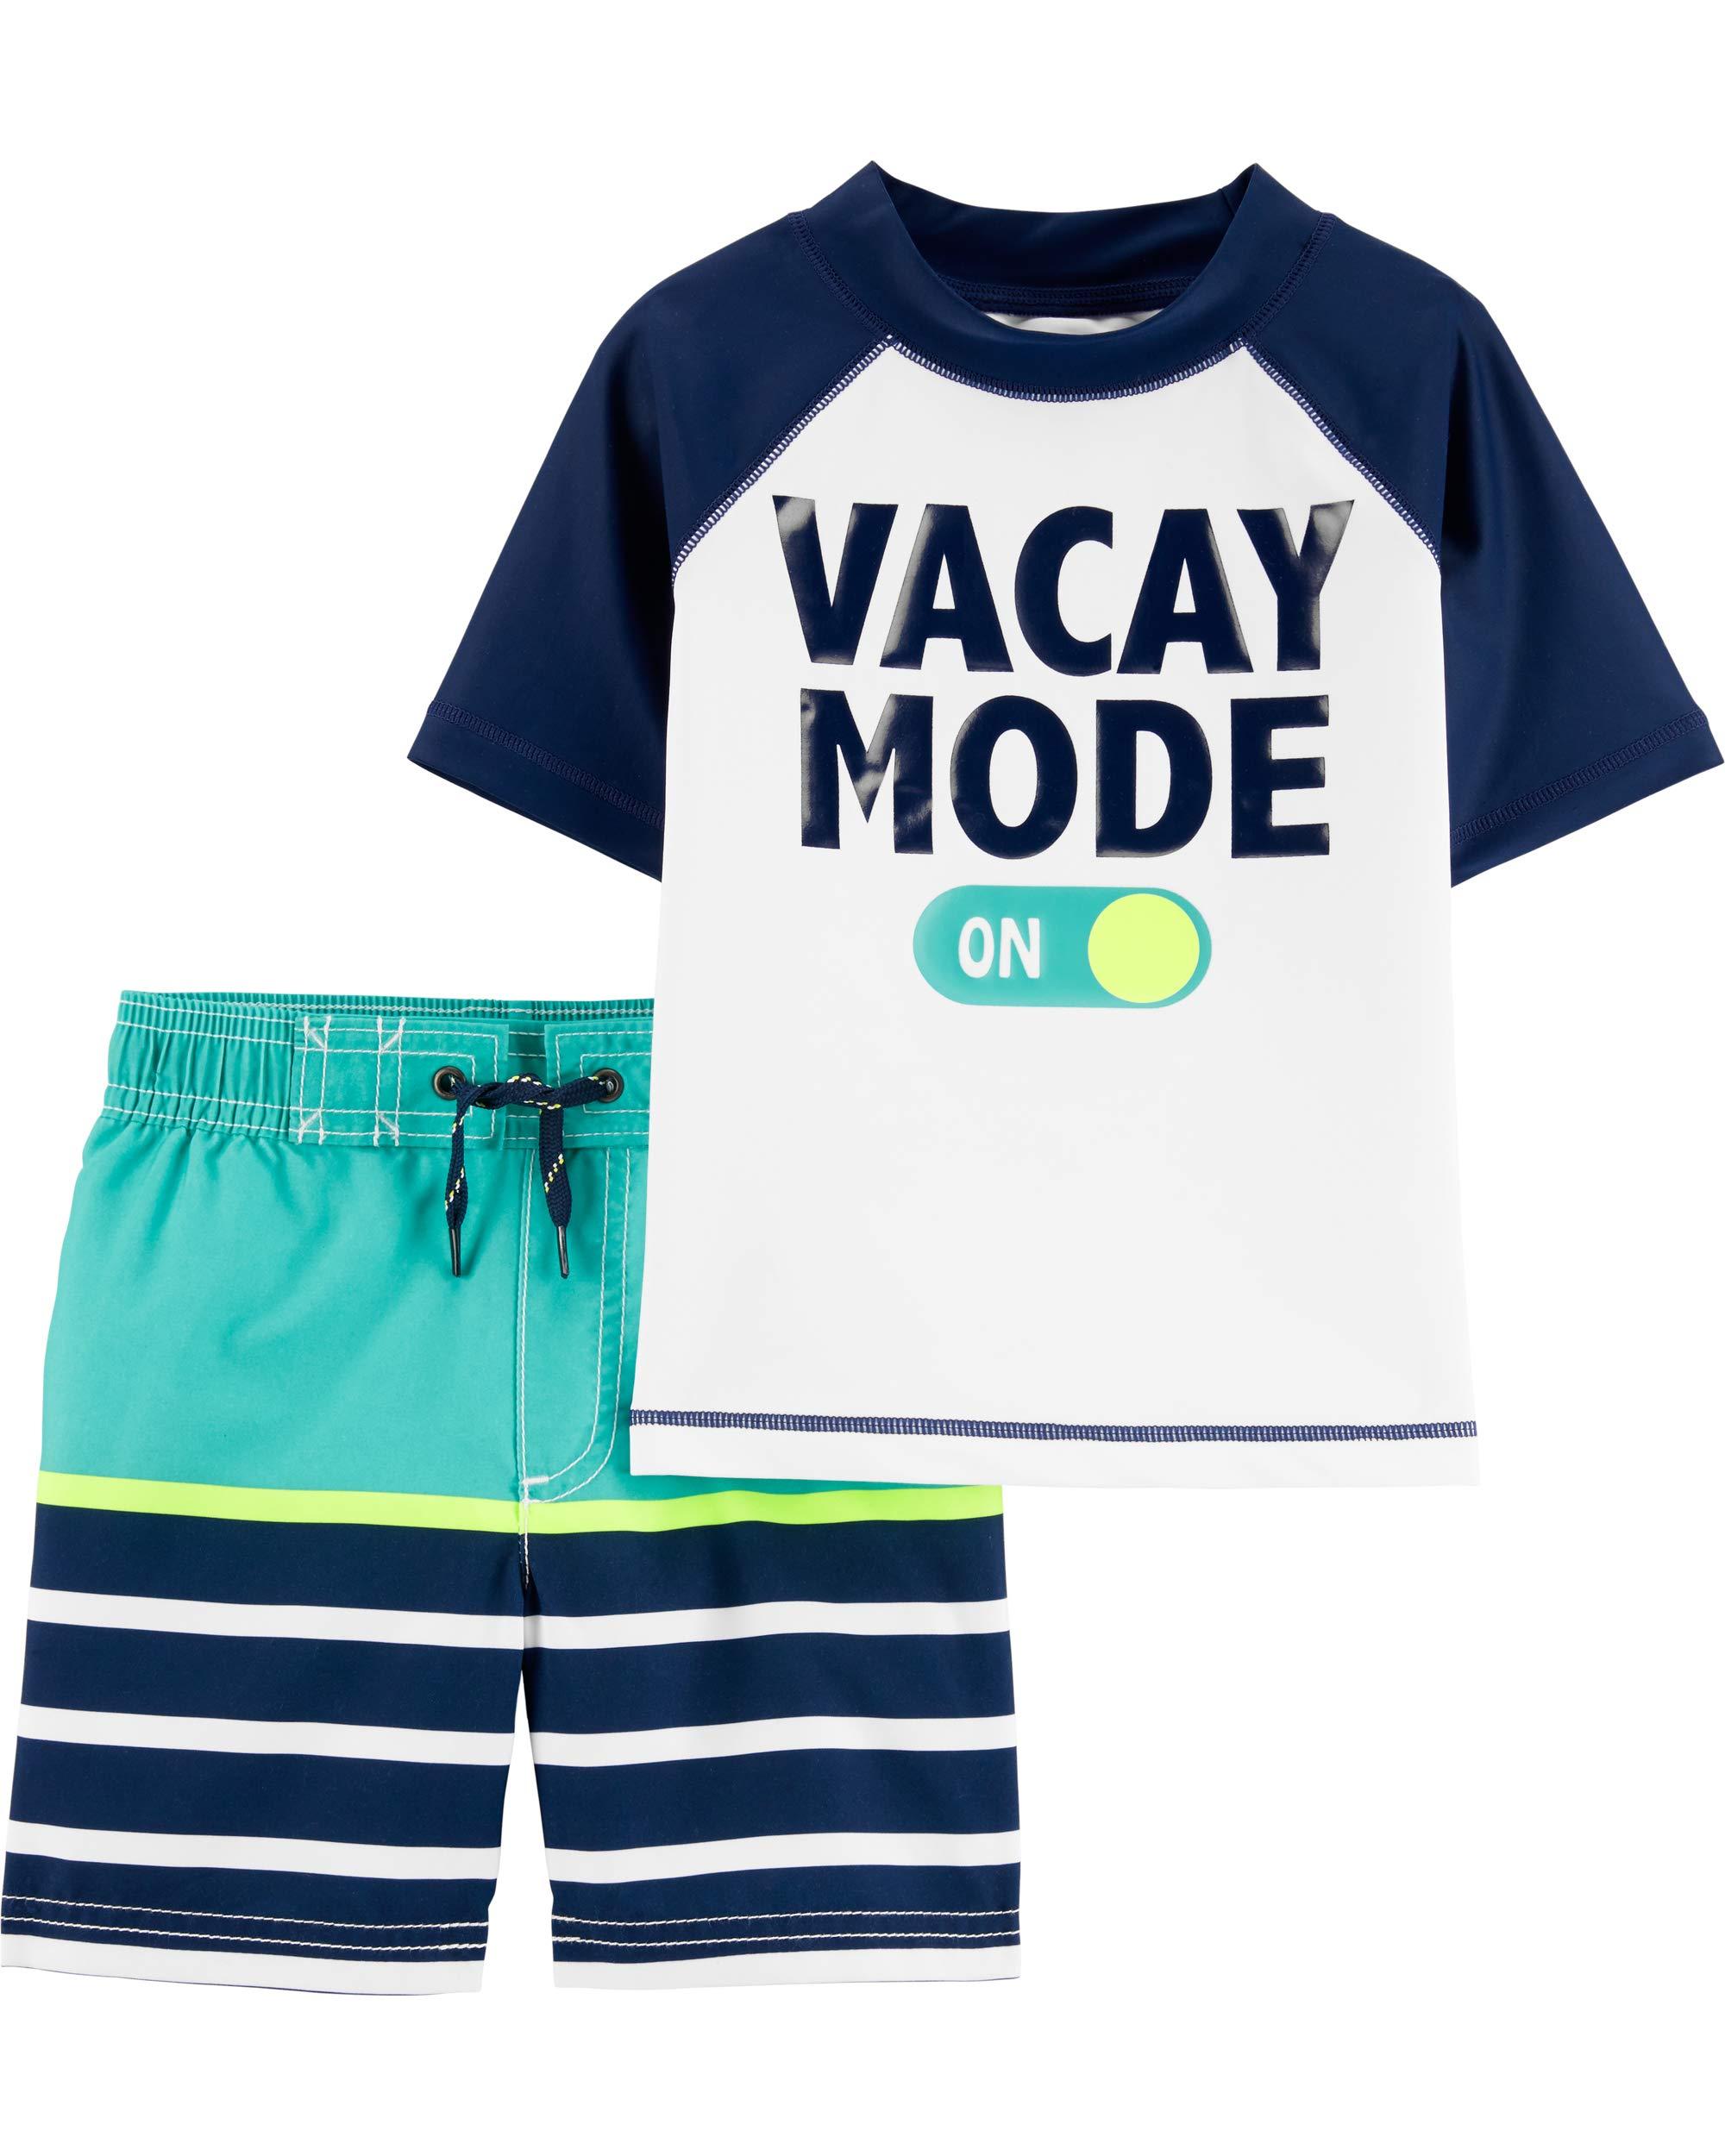 Carter's Toddler Boys' Rashguard Swim Set, Vacay